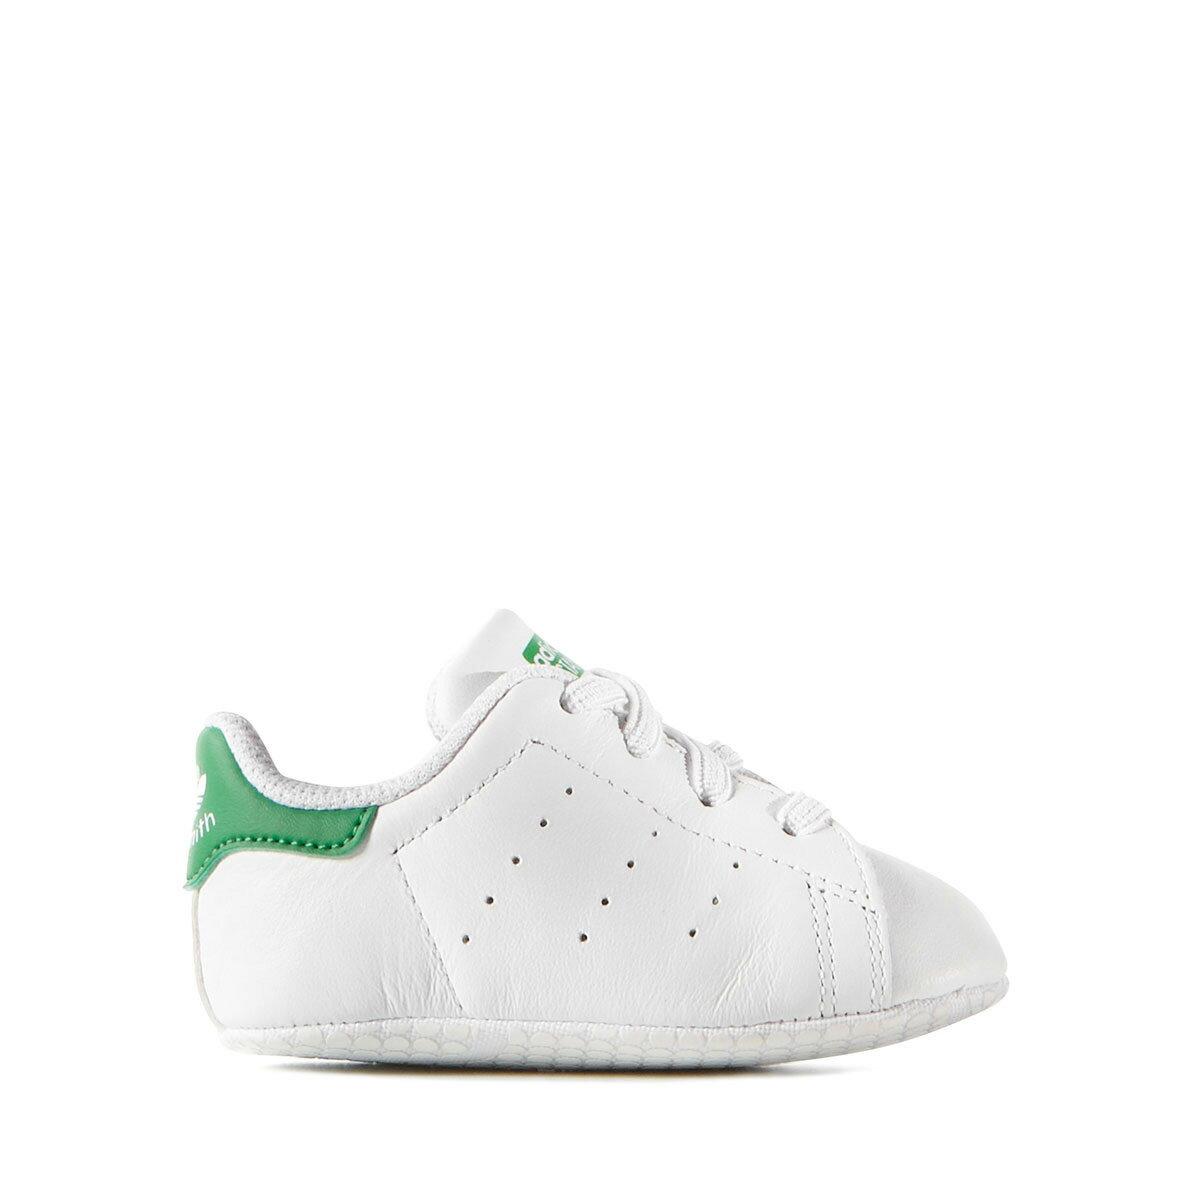 adidas Originals STAN SMITH CRIB(アディダス オリジナルス スタンスミス クリブ)Running White Ftw / Running White Ftw / Green【キッズ スニーカー】18SS-I